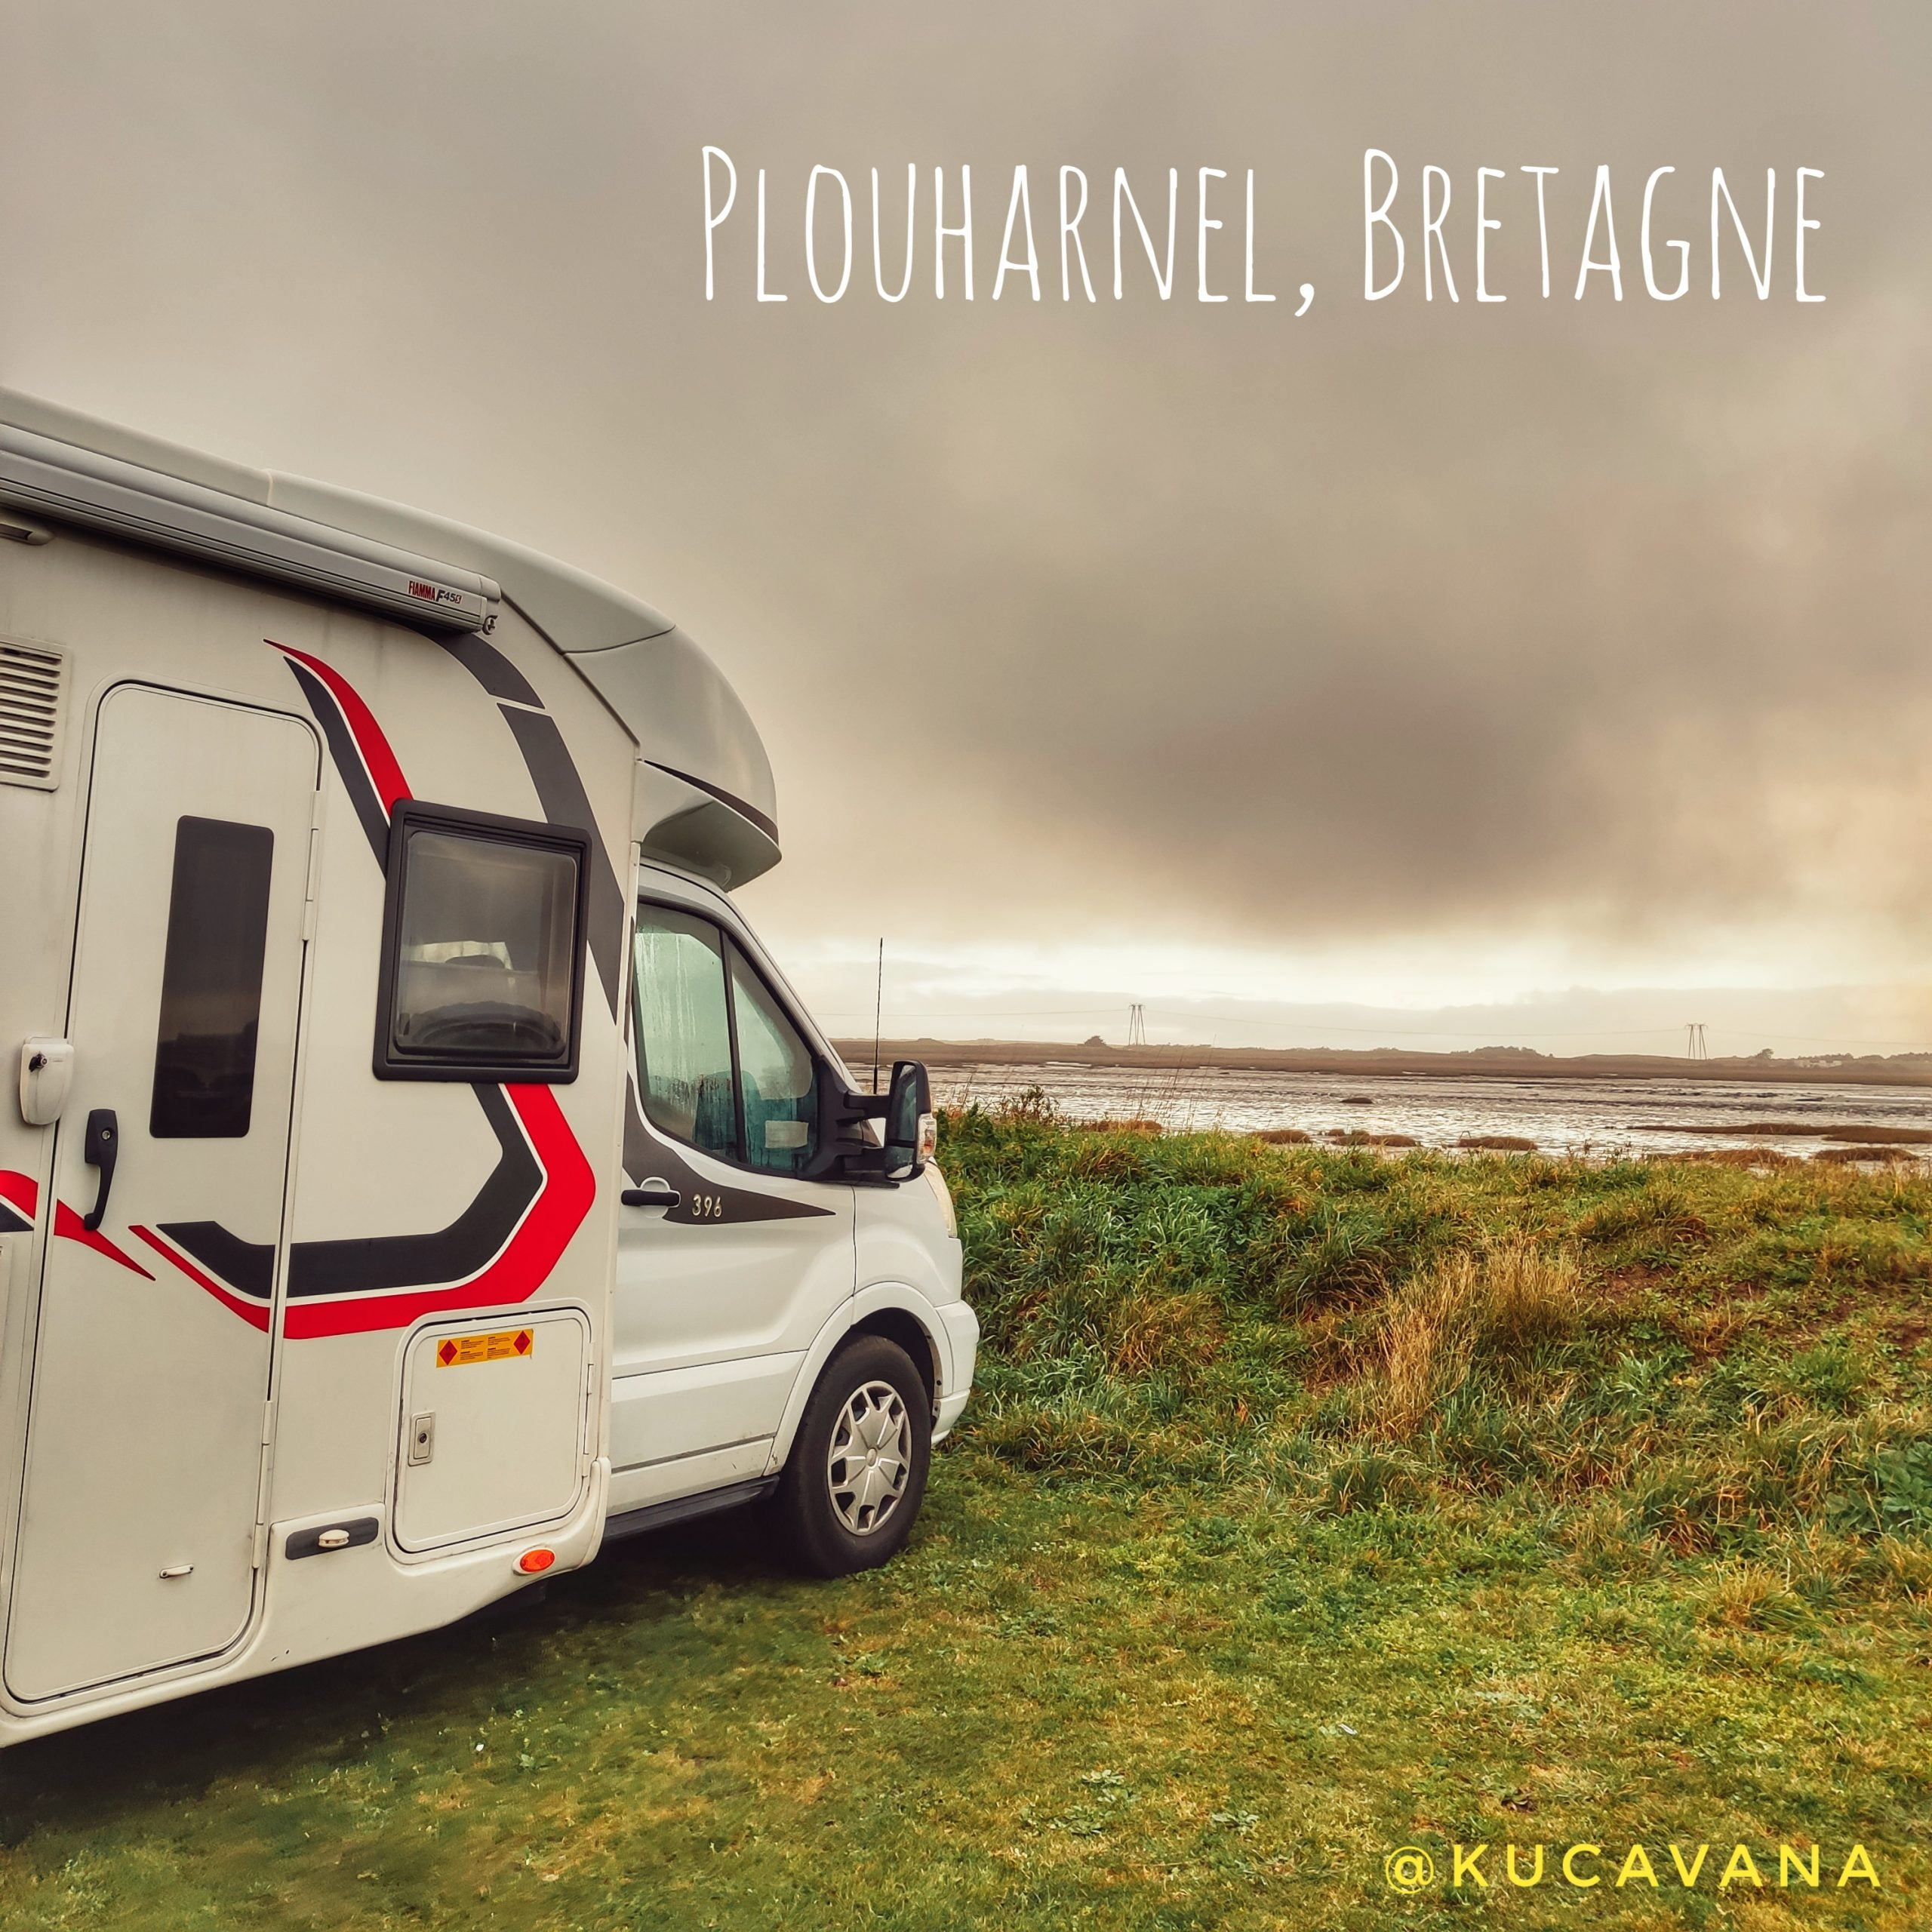 bretagne française en camping-car